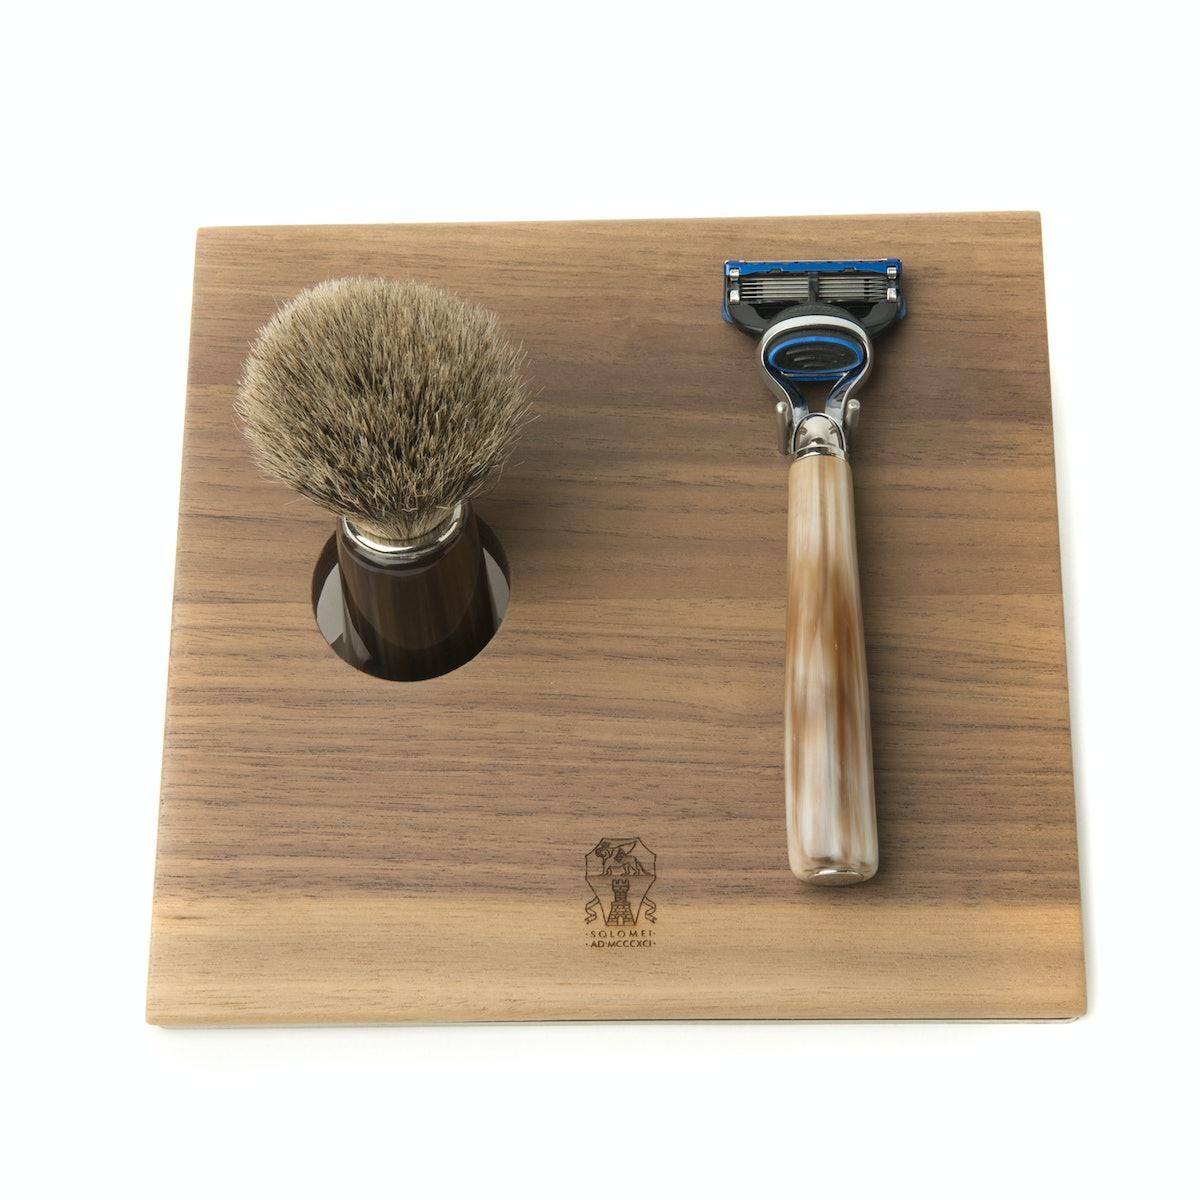 Brunello Cucinelli shaving set